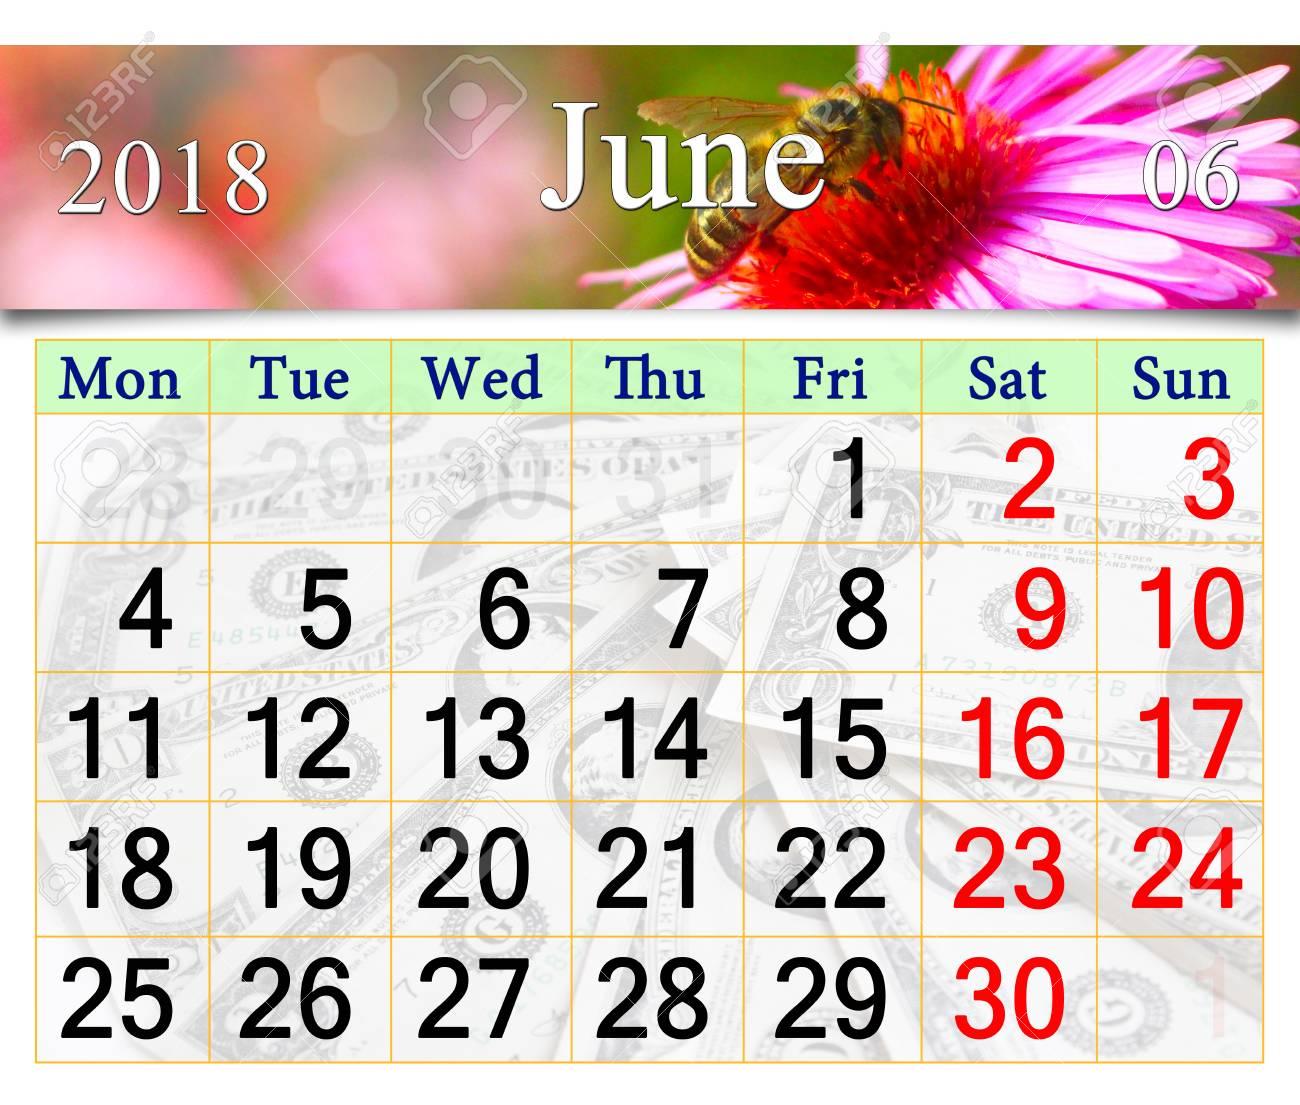 Floral Calendar June 2018 Pink